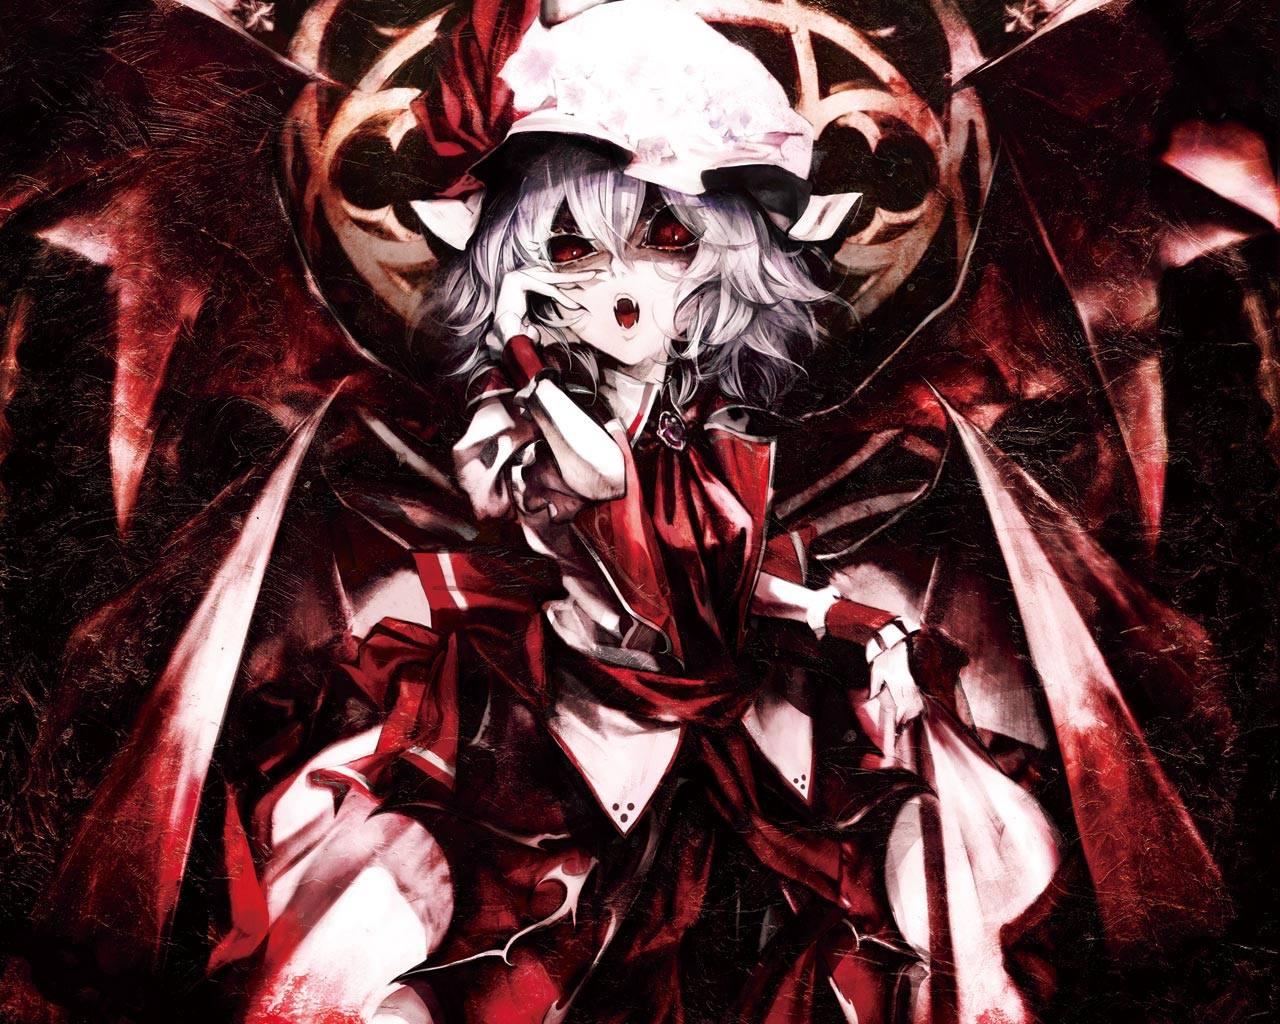 Anime Images Anime Vampire Girl Wallpaper Photos  X